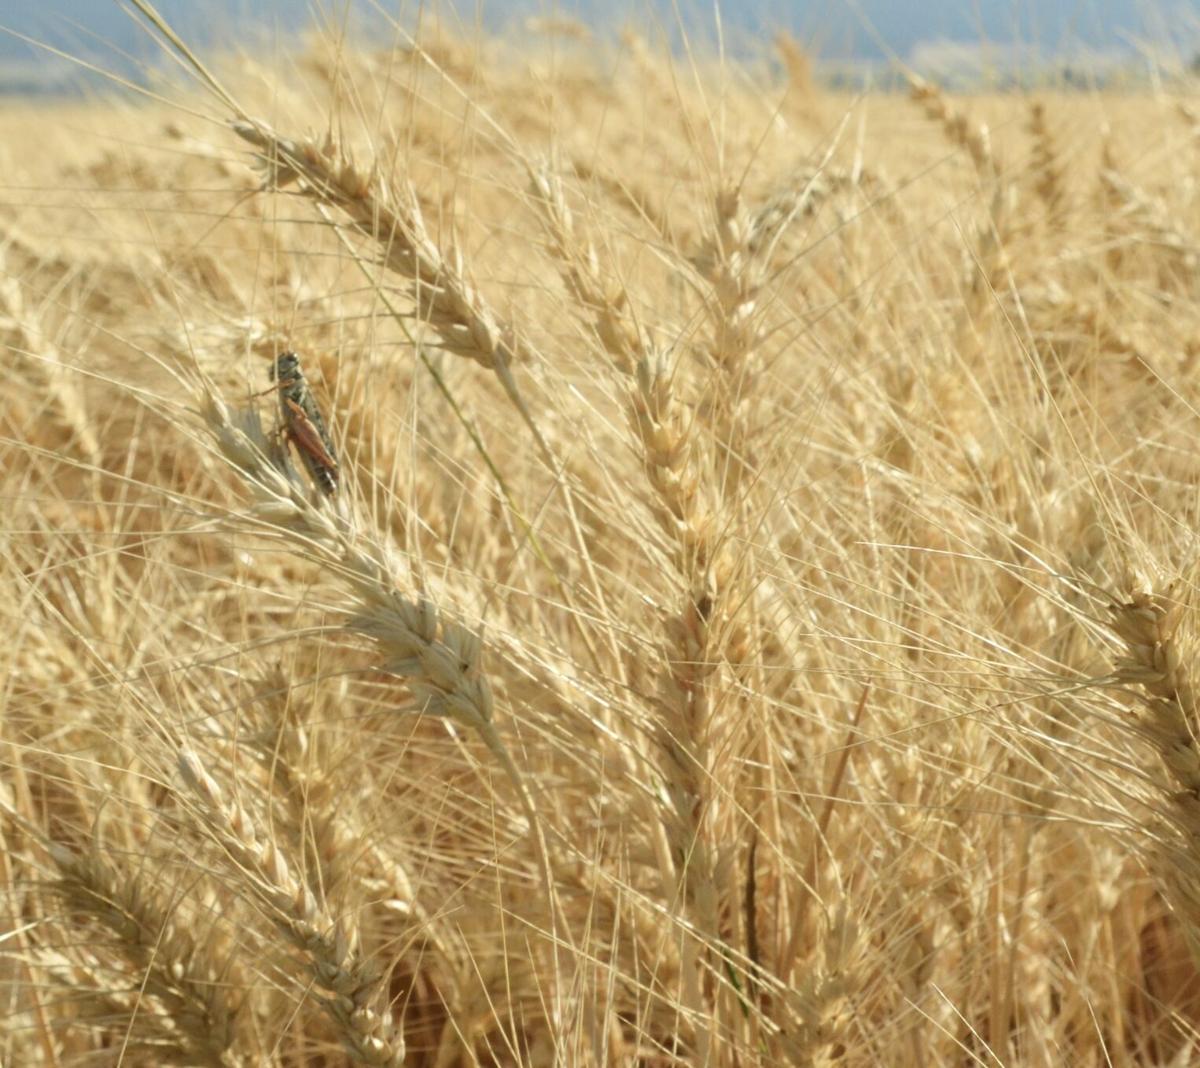 2wheat 2267 for 090920.jpg